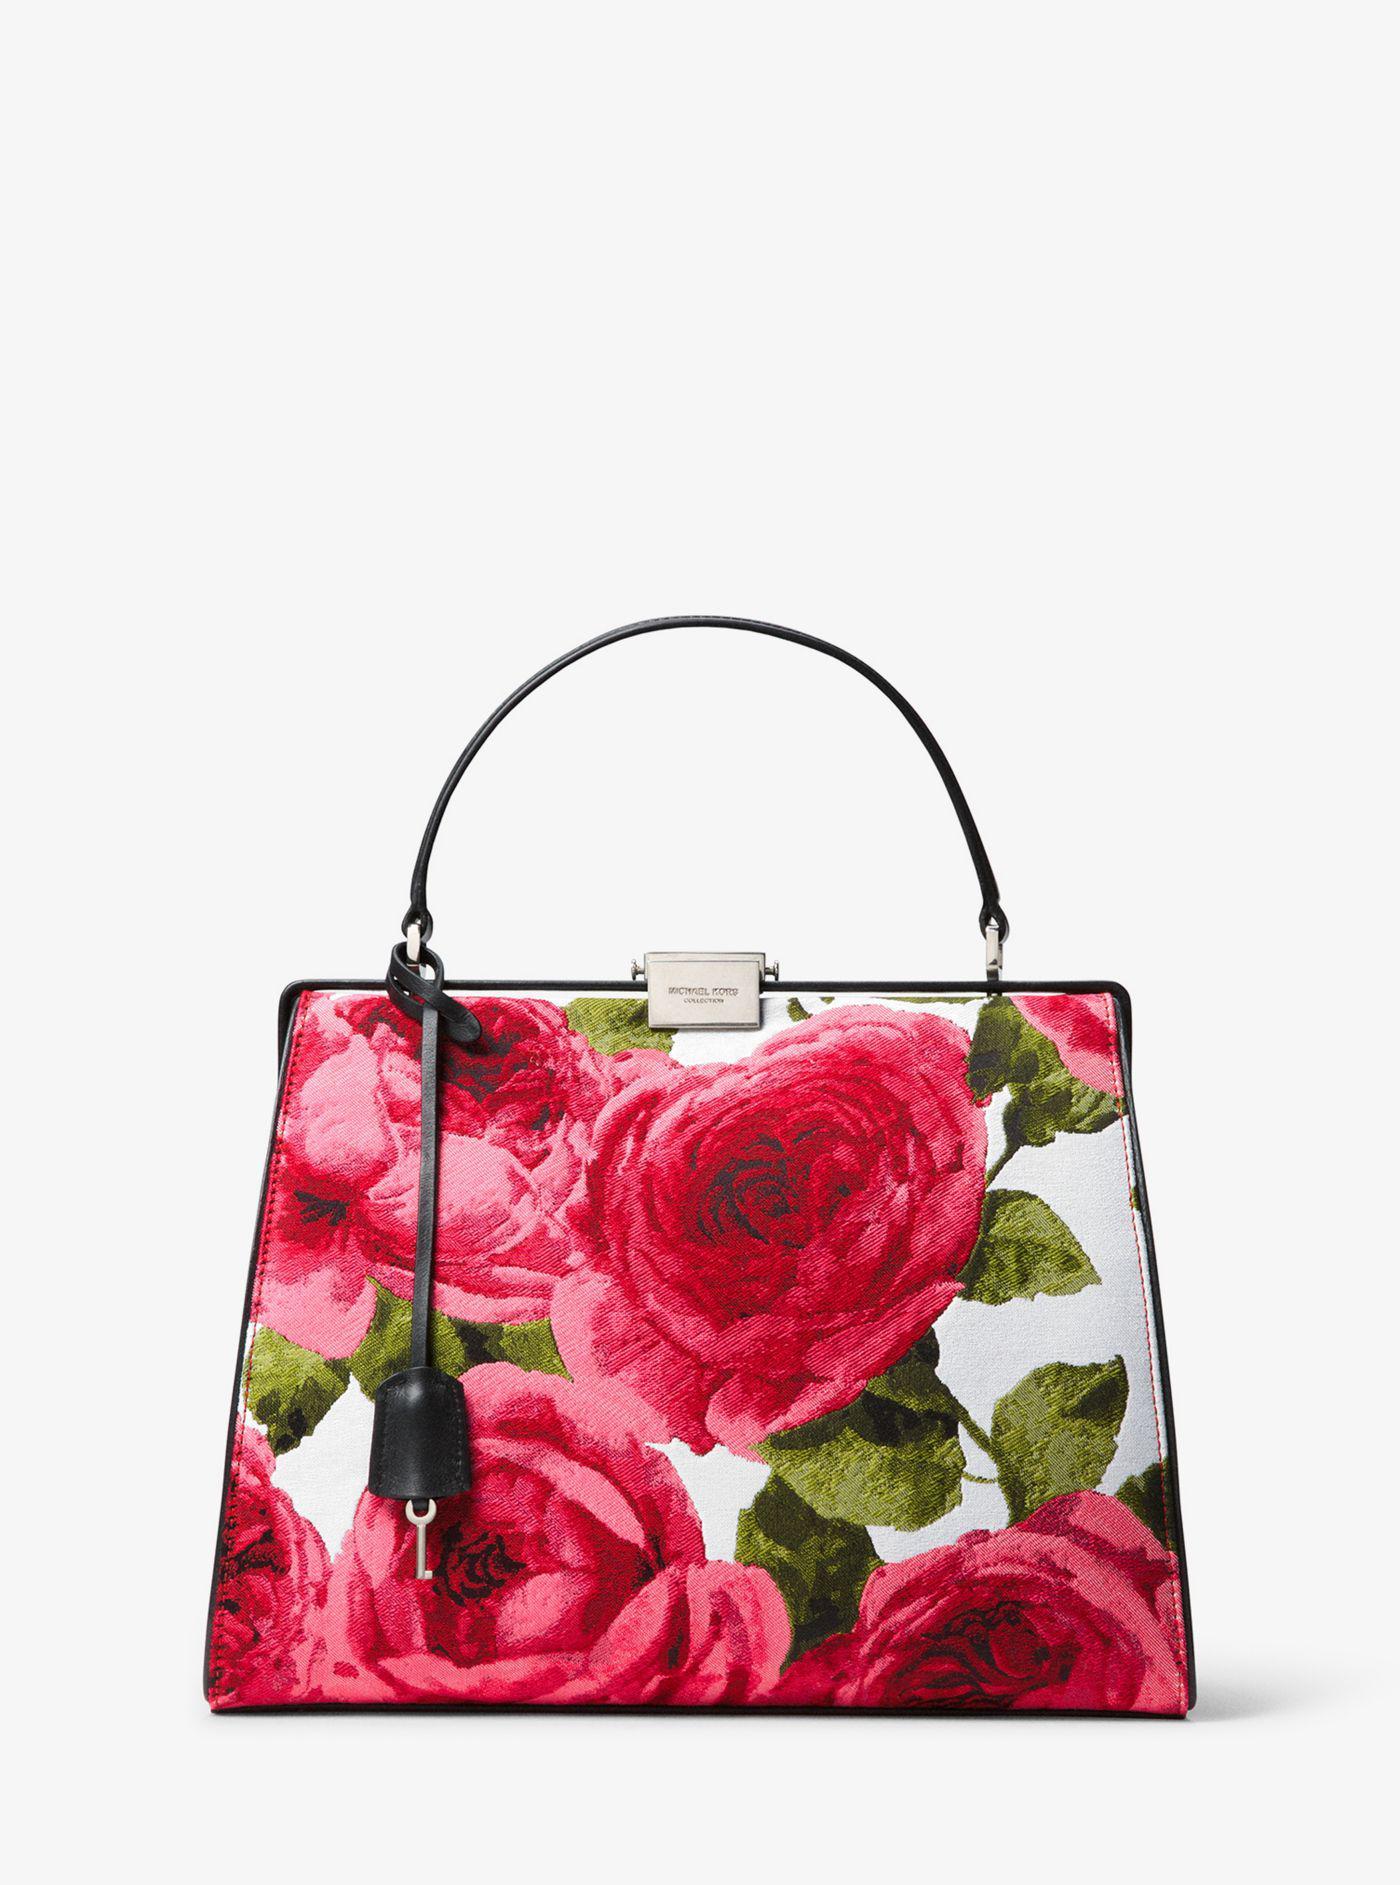 6004e6a8076d6 ... promo code for lyst michael kors simone rose brocade top handle bag  06ccf 8af5a